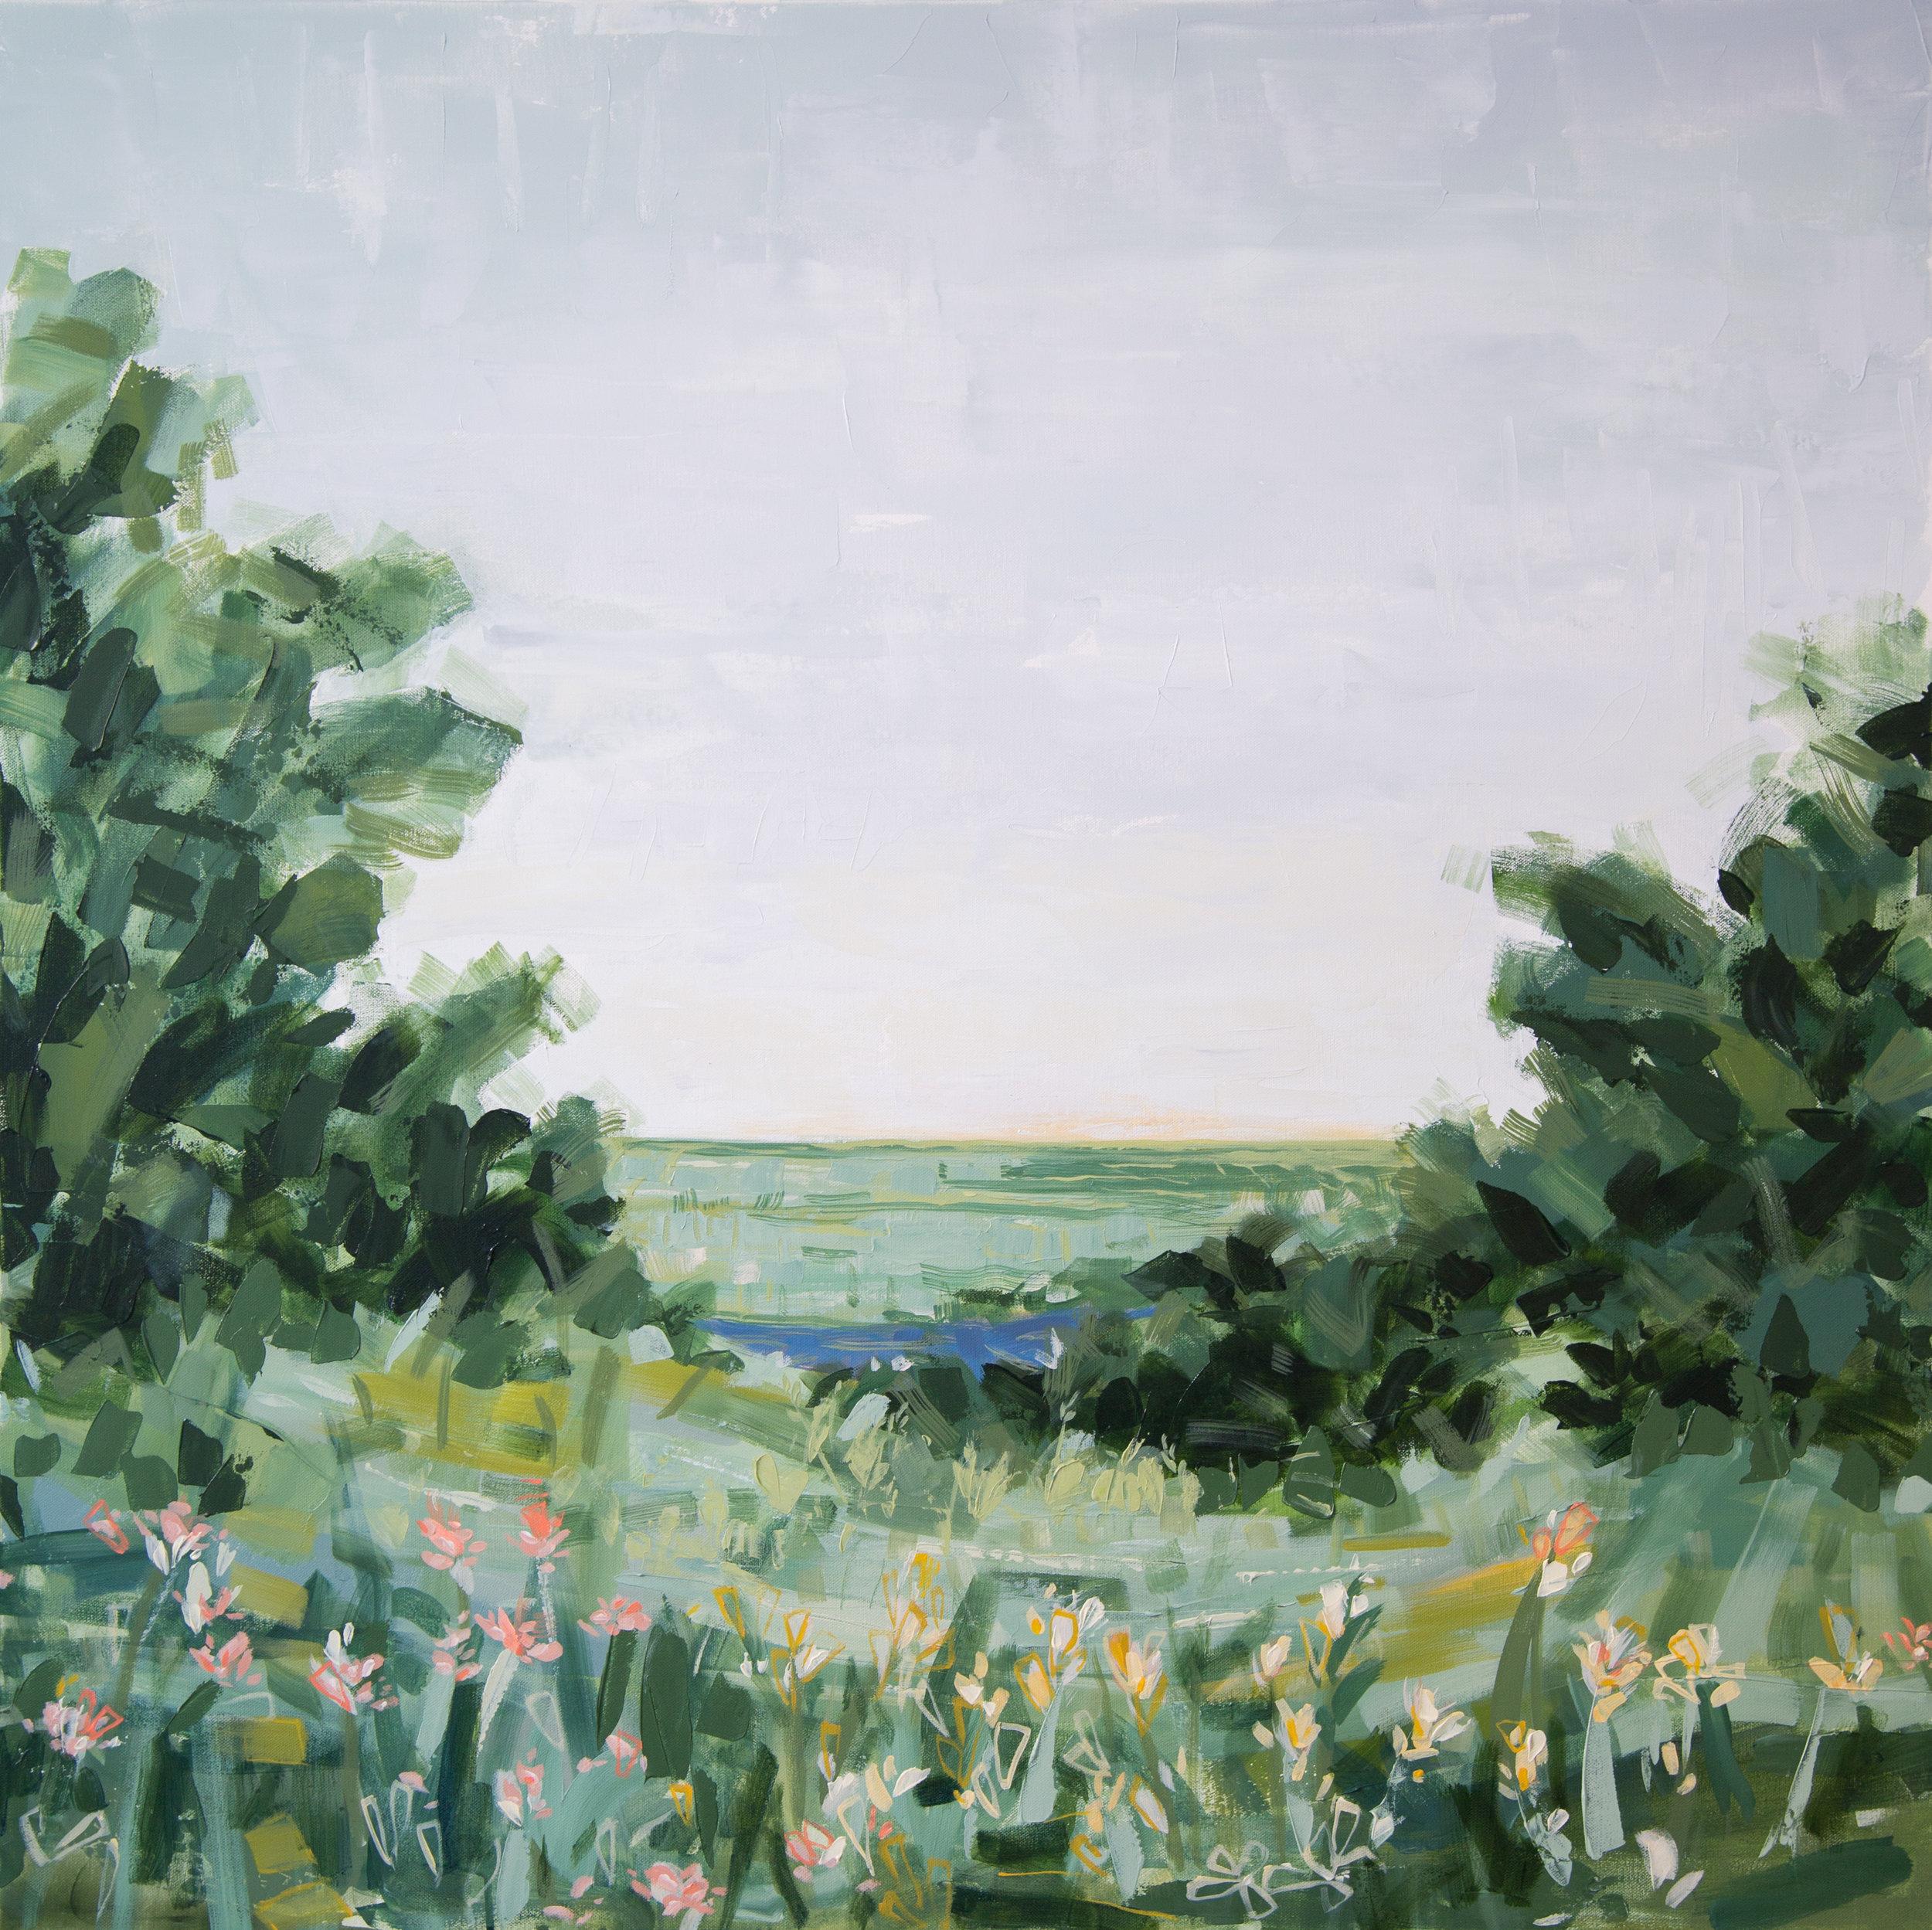 Chapman_Lucy_Painting_StrawberryBench_Brevard_Transylvania.jpg